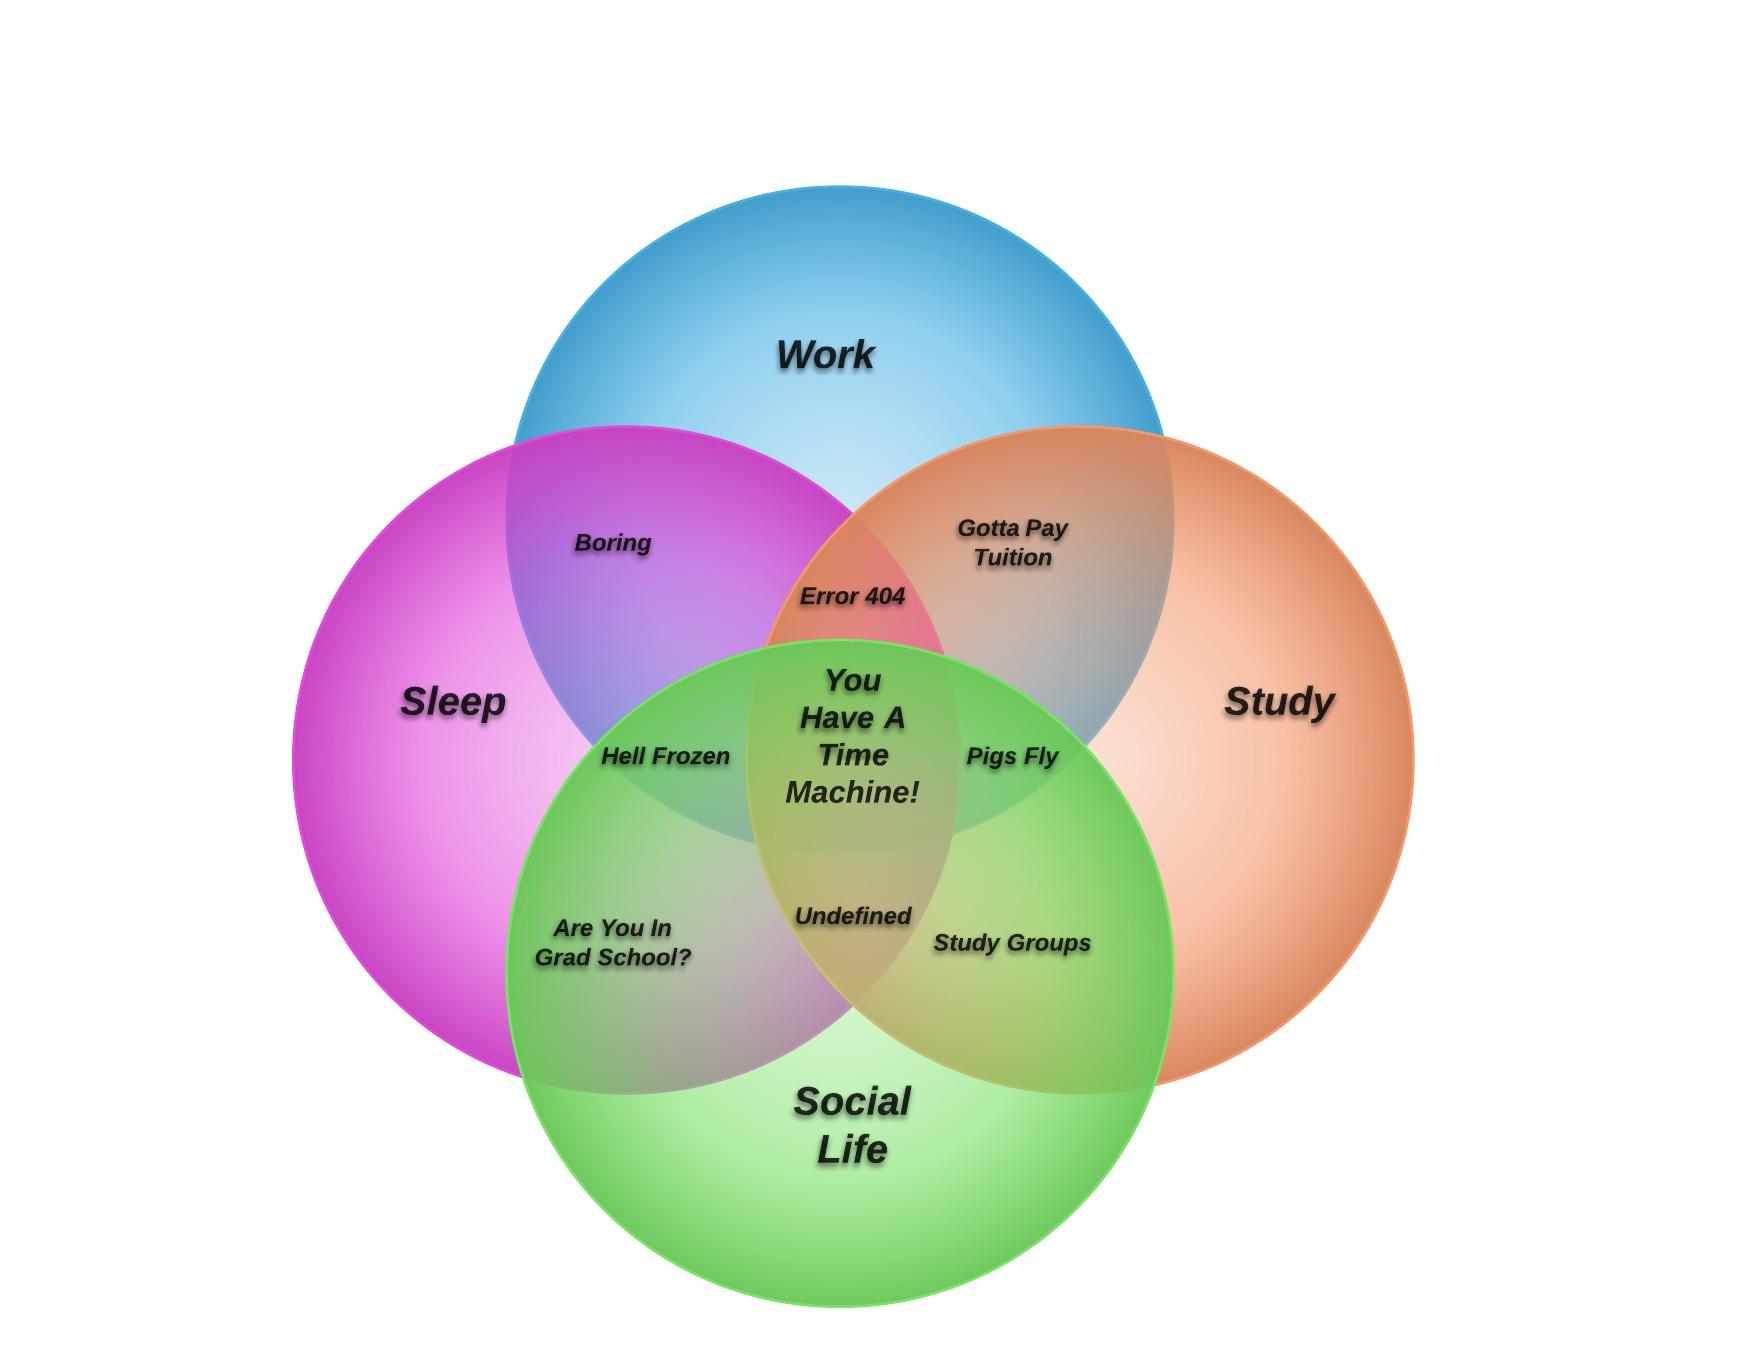 diagram of life grad school & a social life | marginalia tree of life sephiroth diagram